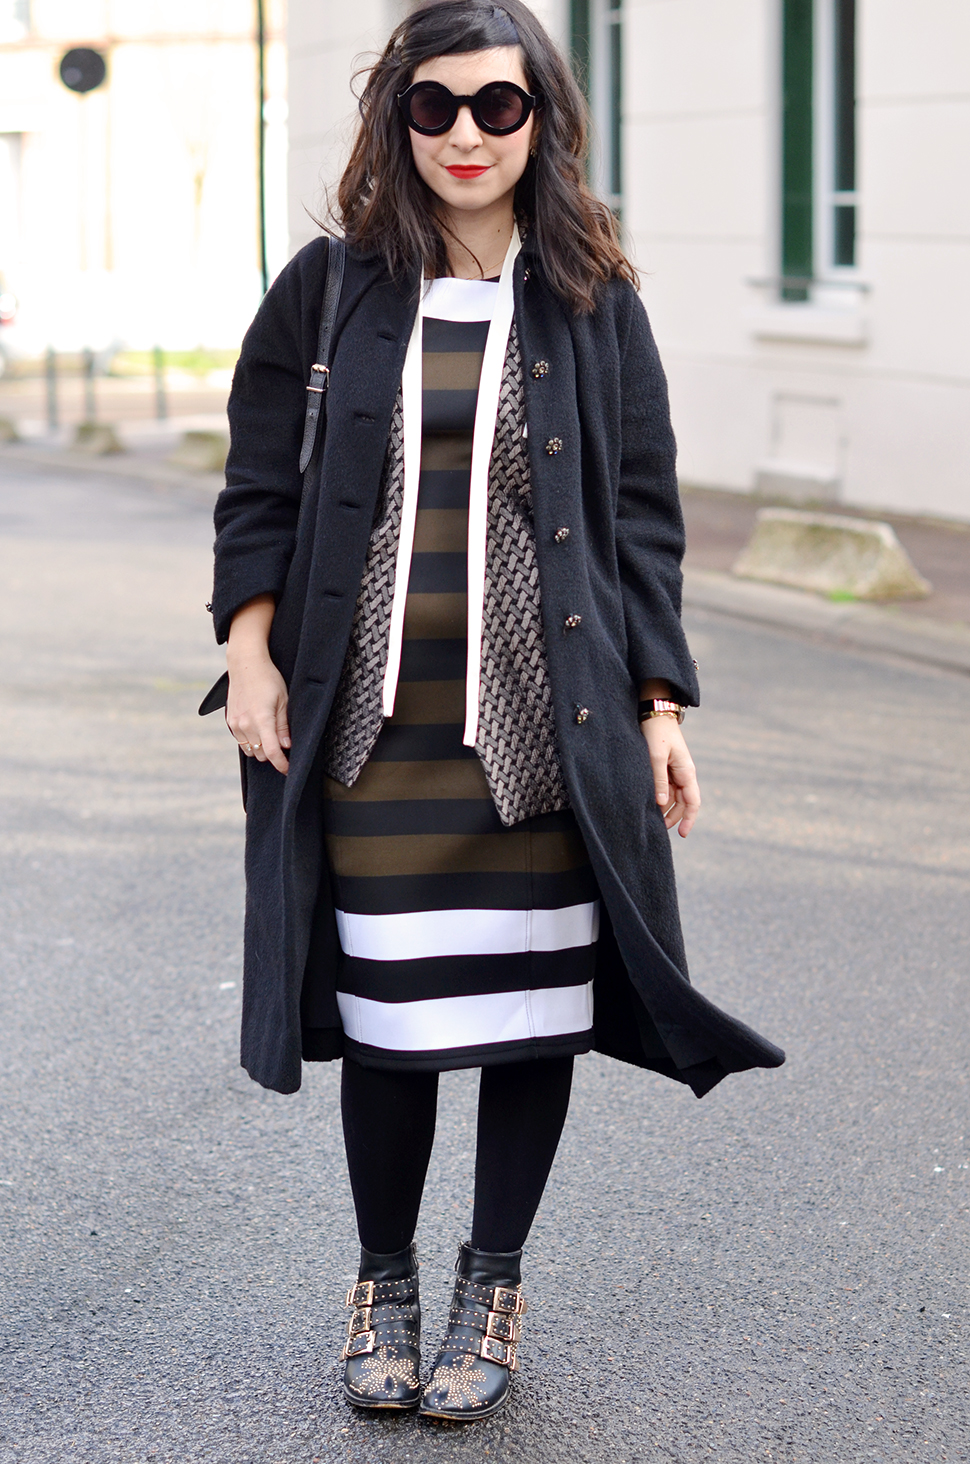 midi_length_dress_stripes11